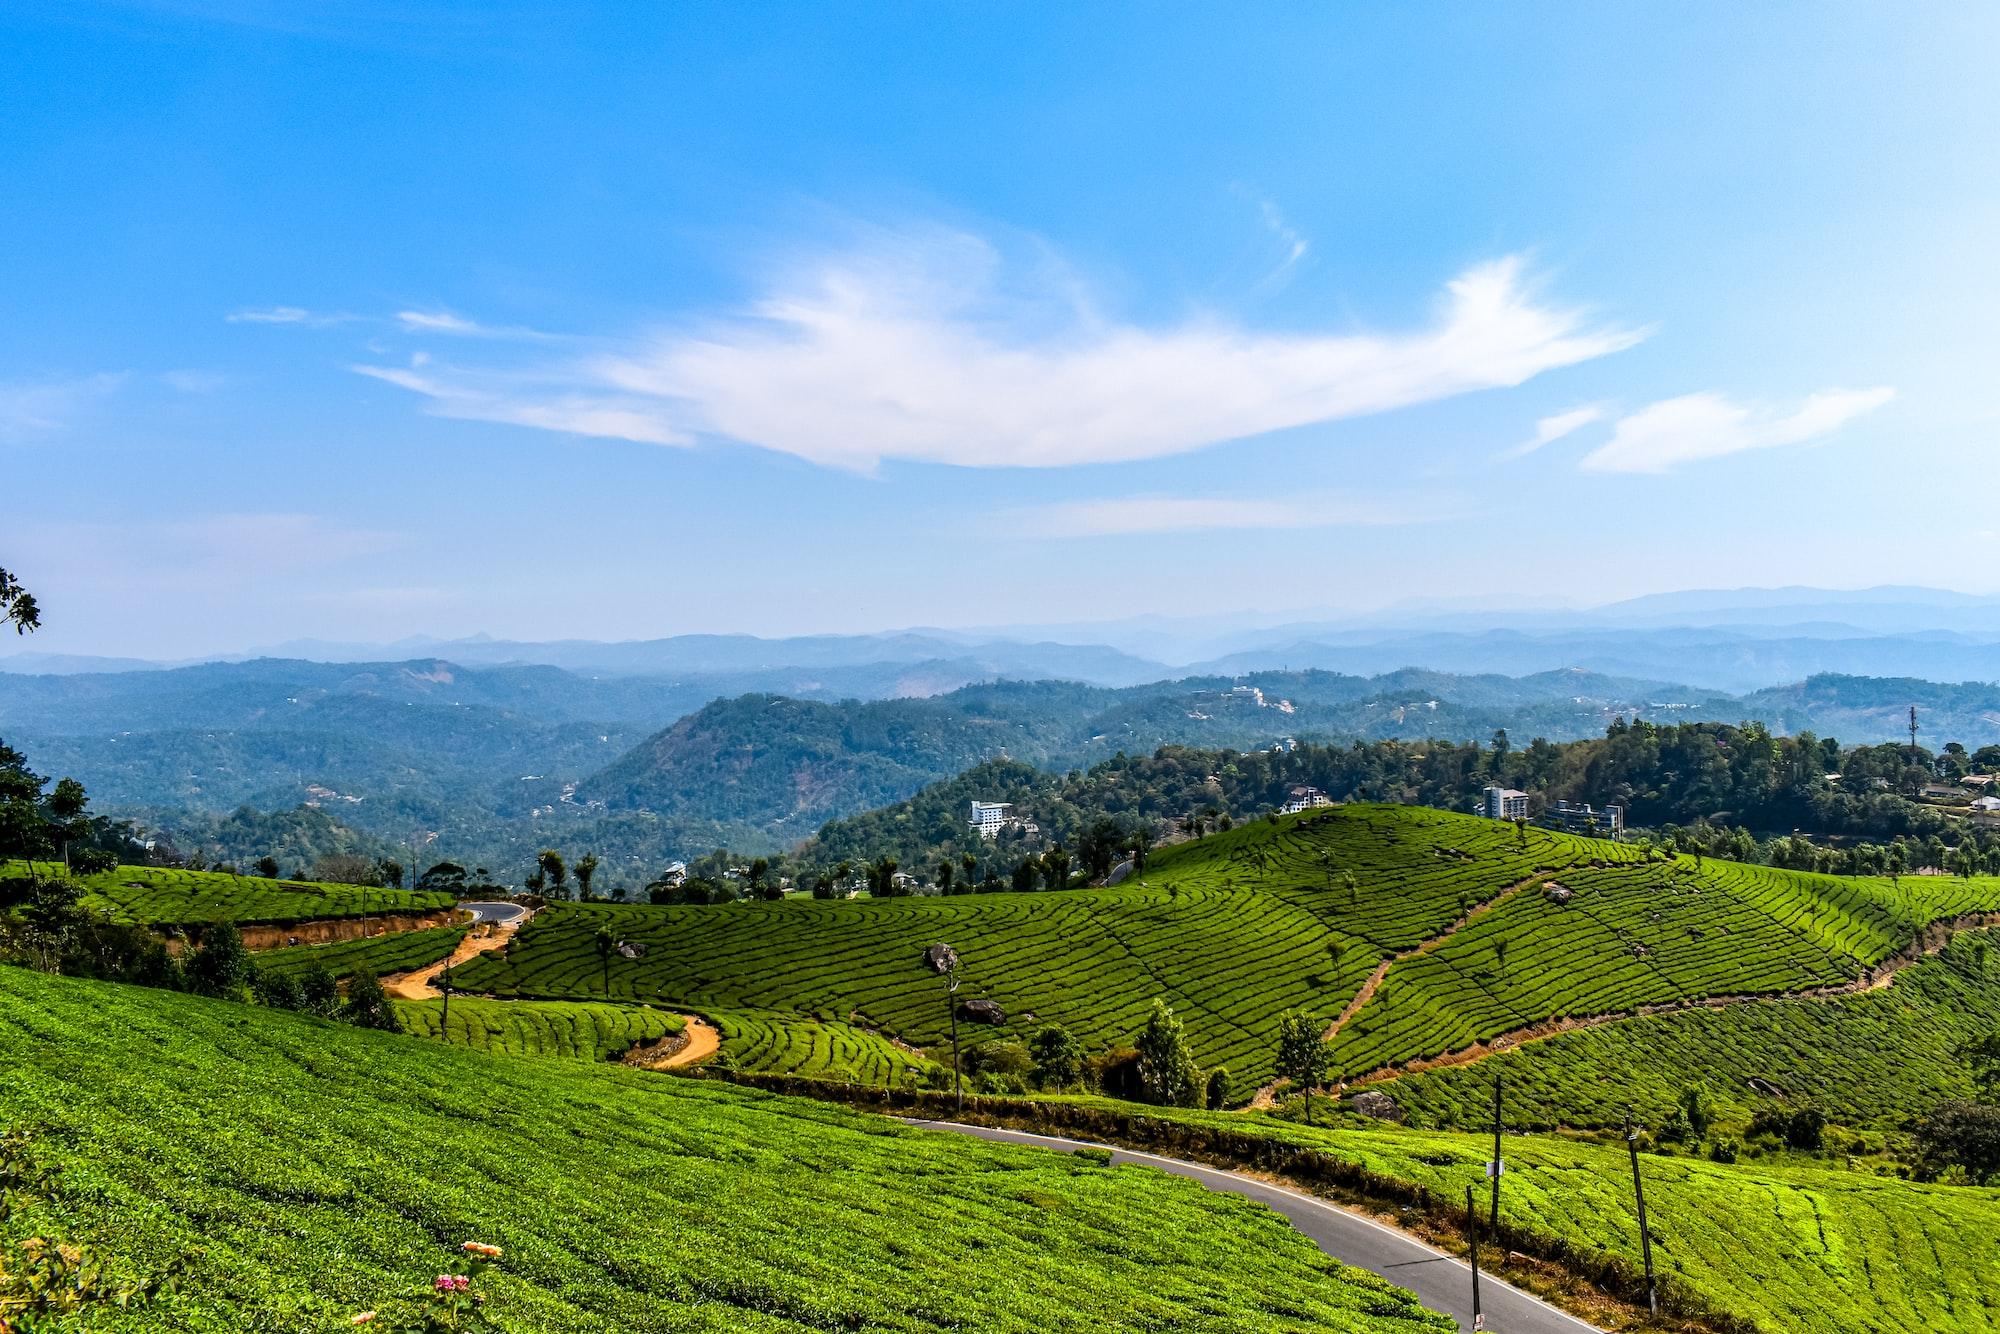 Munnar Tea Garden, Munnar, Kerala, India